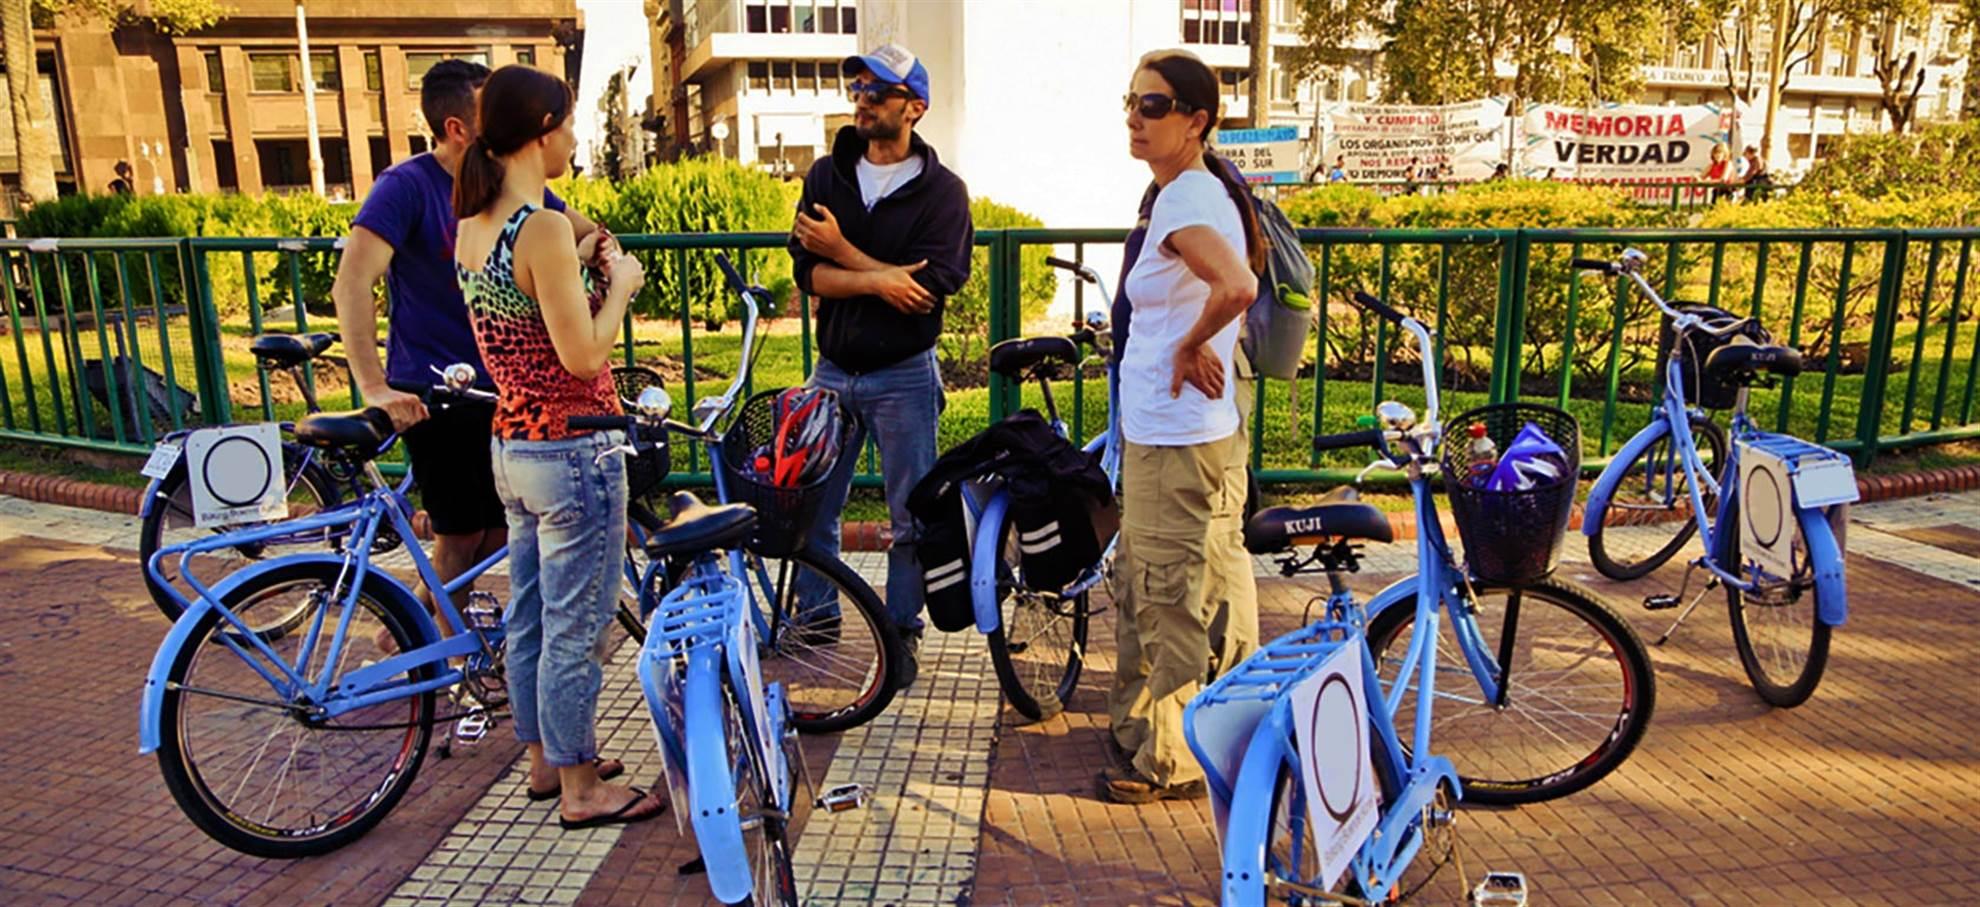 Tour de bicicleta – Destaques de Sevilha